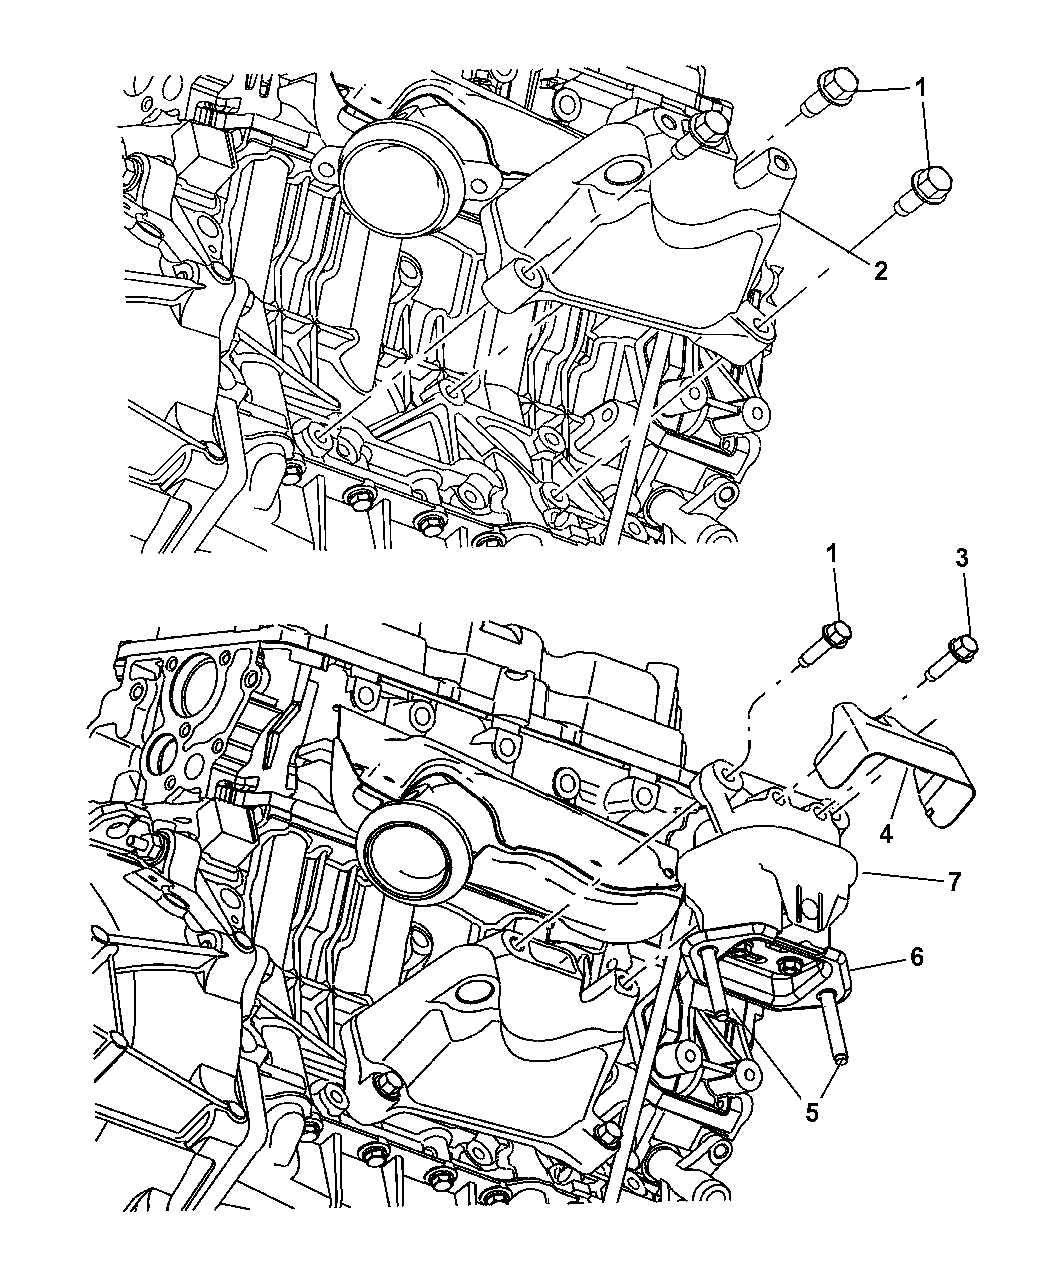 2008 Dodge Charger Engine Mounting Mopar Parts Giant 08 Diagram Thumbnail 1